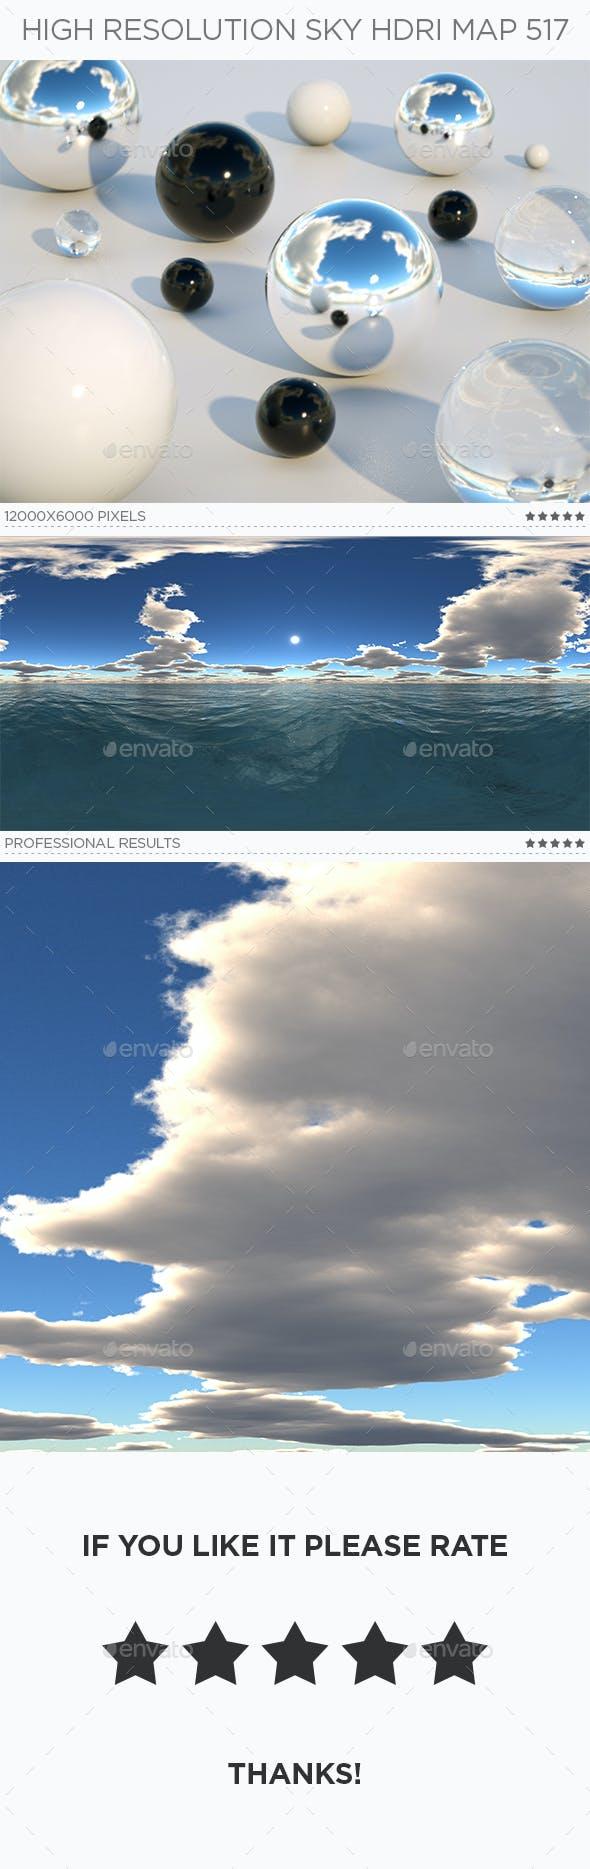 High Resolution Sky HDRi Map 517 - 3DOcean Item for Sale